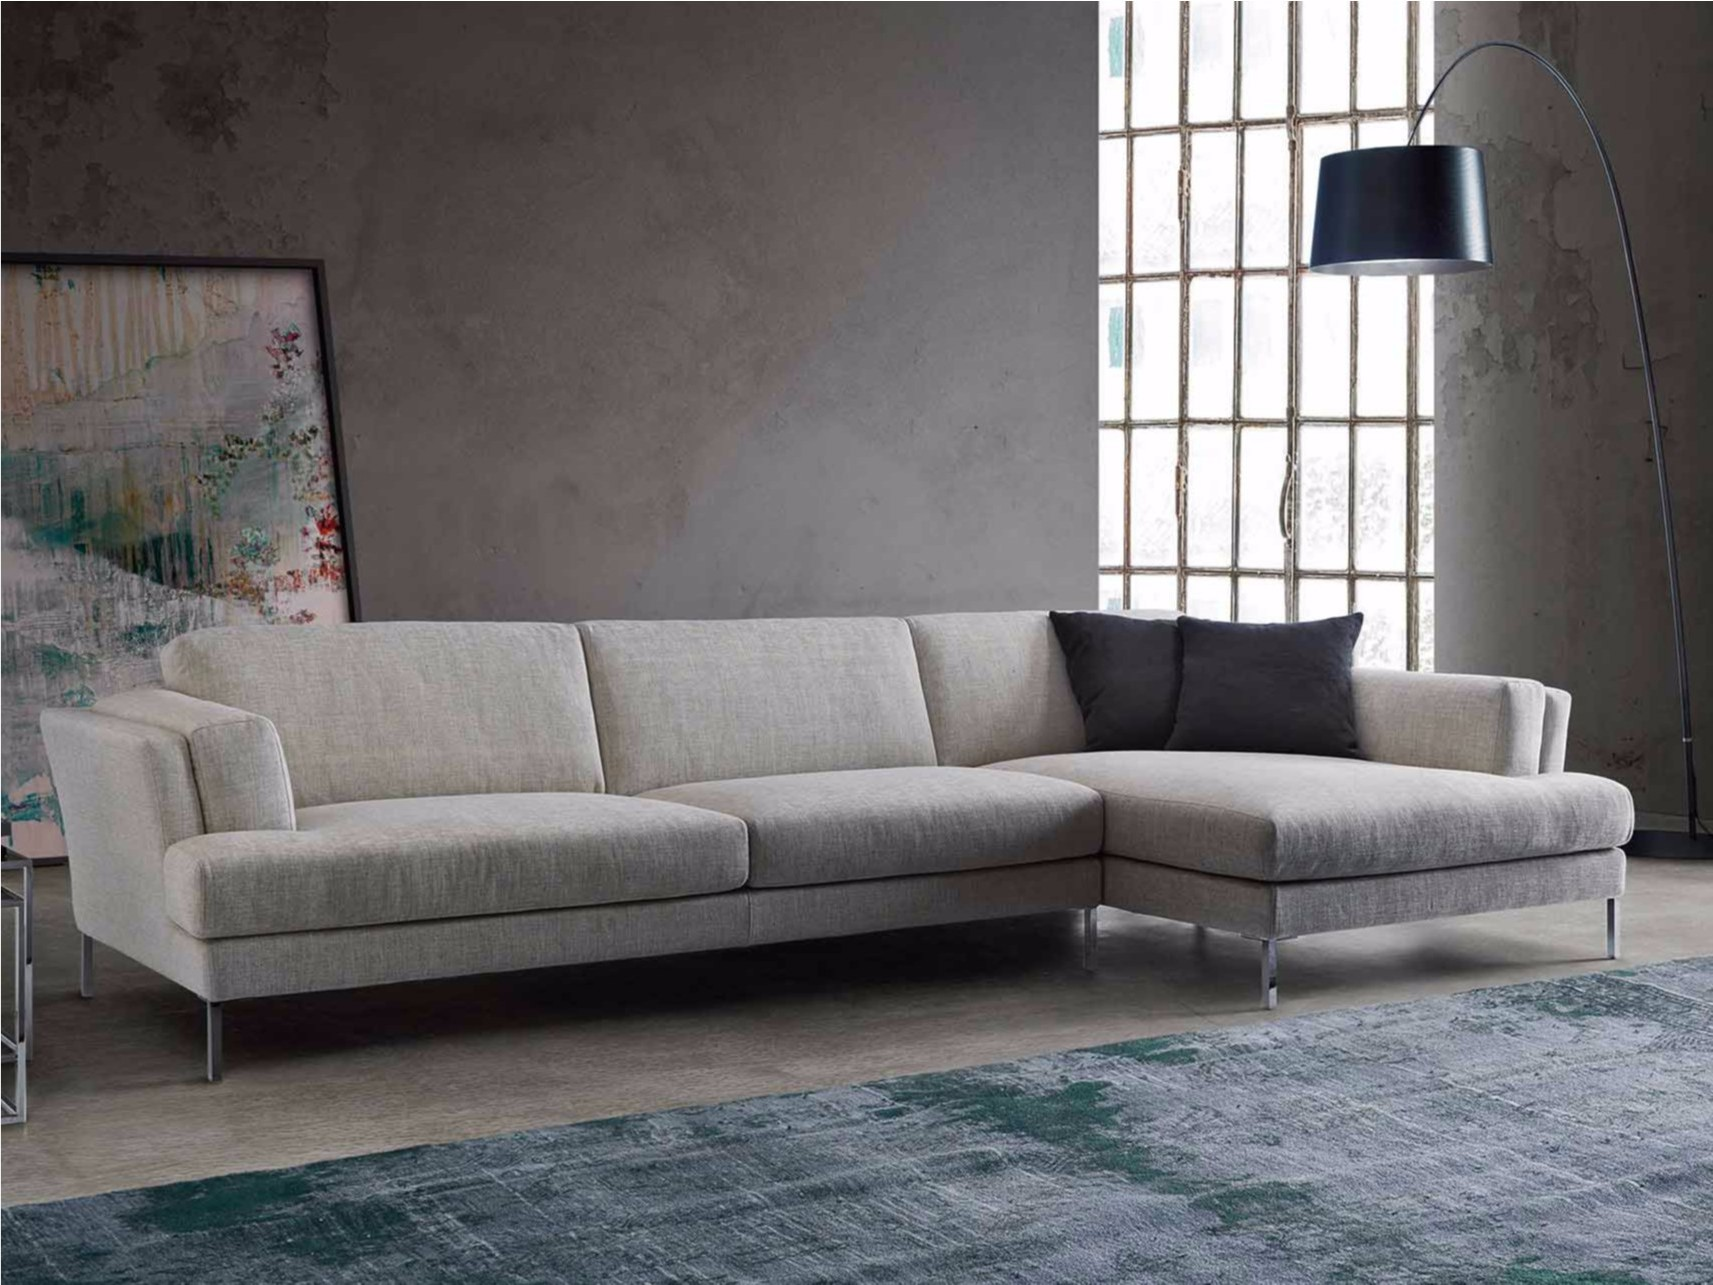 canap d 39 angle convertible gris fly canap id es de d coration de maison vrngnovb3l. Black Bedroom Furniture Sets. Home Design Ideas